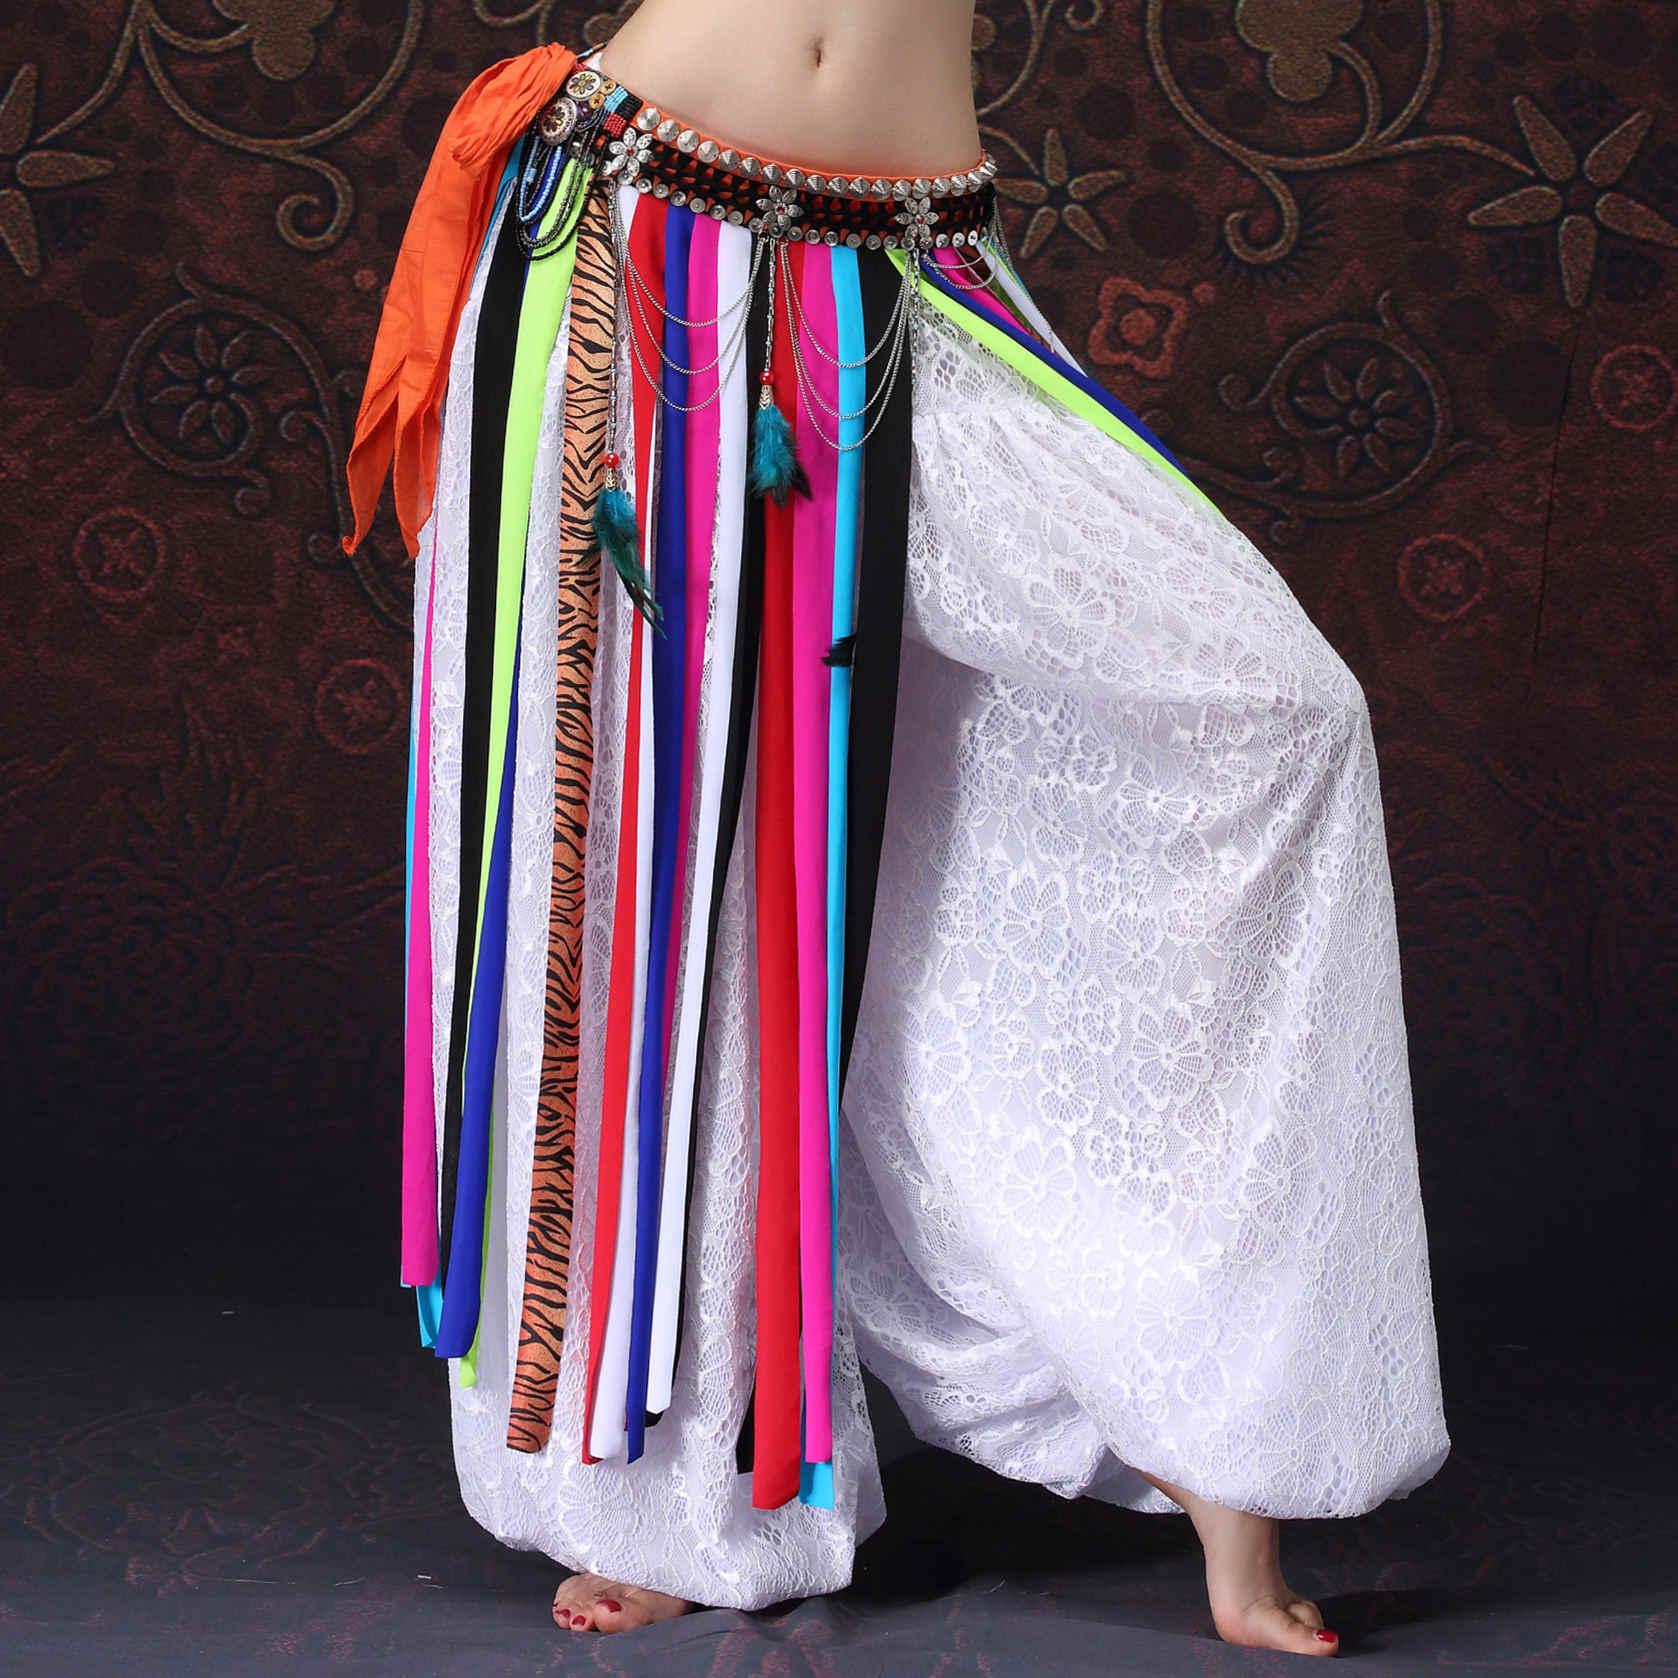 Modern ATS Suku Gaya Tari Perut Pakaian Kostum Aksesoris Wanita Gypsy Dansa Celana Harem Hollow Celana